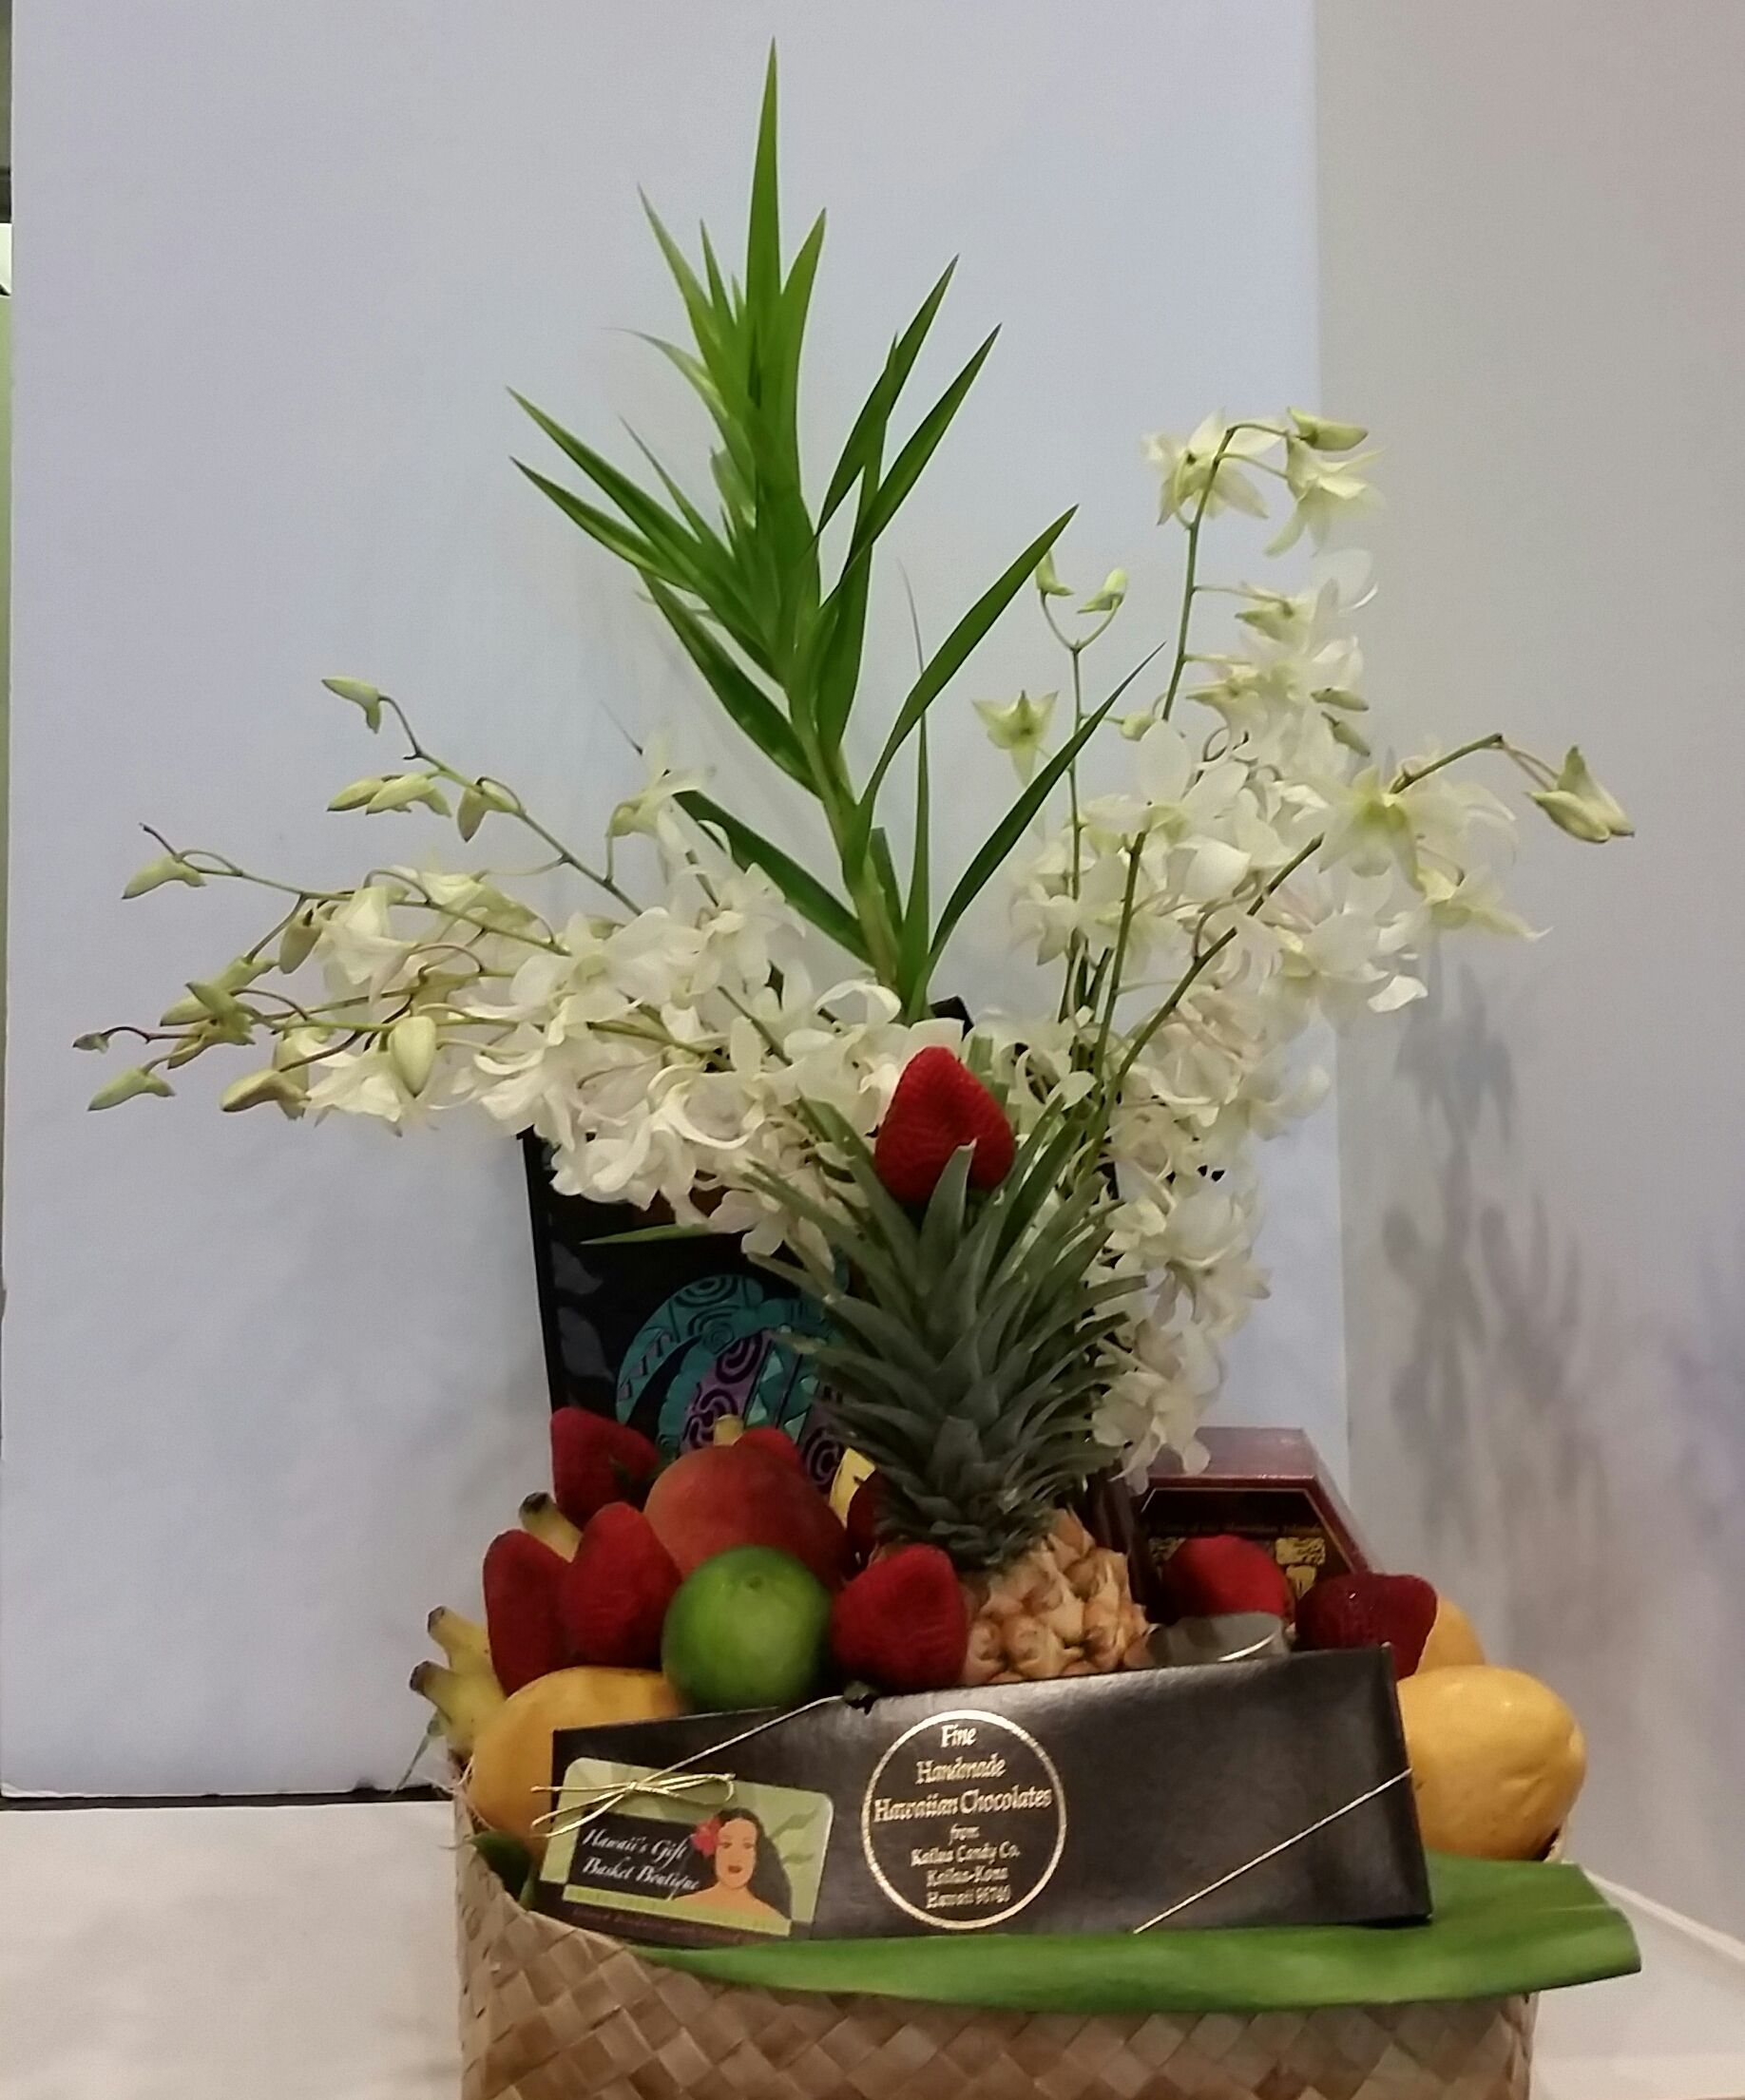 Hawaiian style fruit basket customized with chocolate